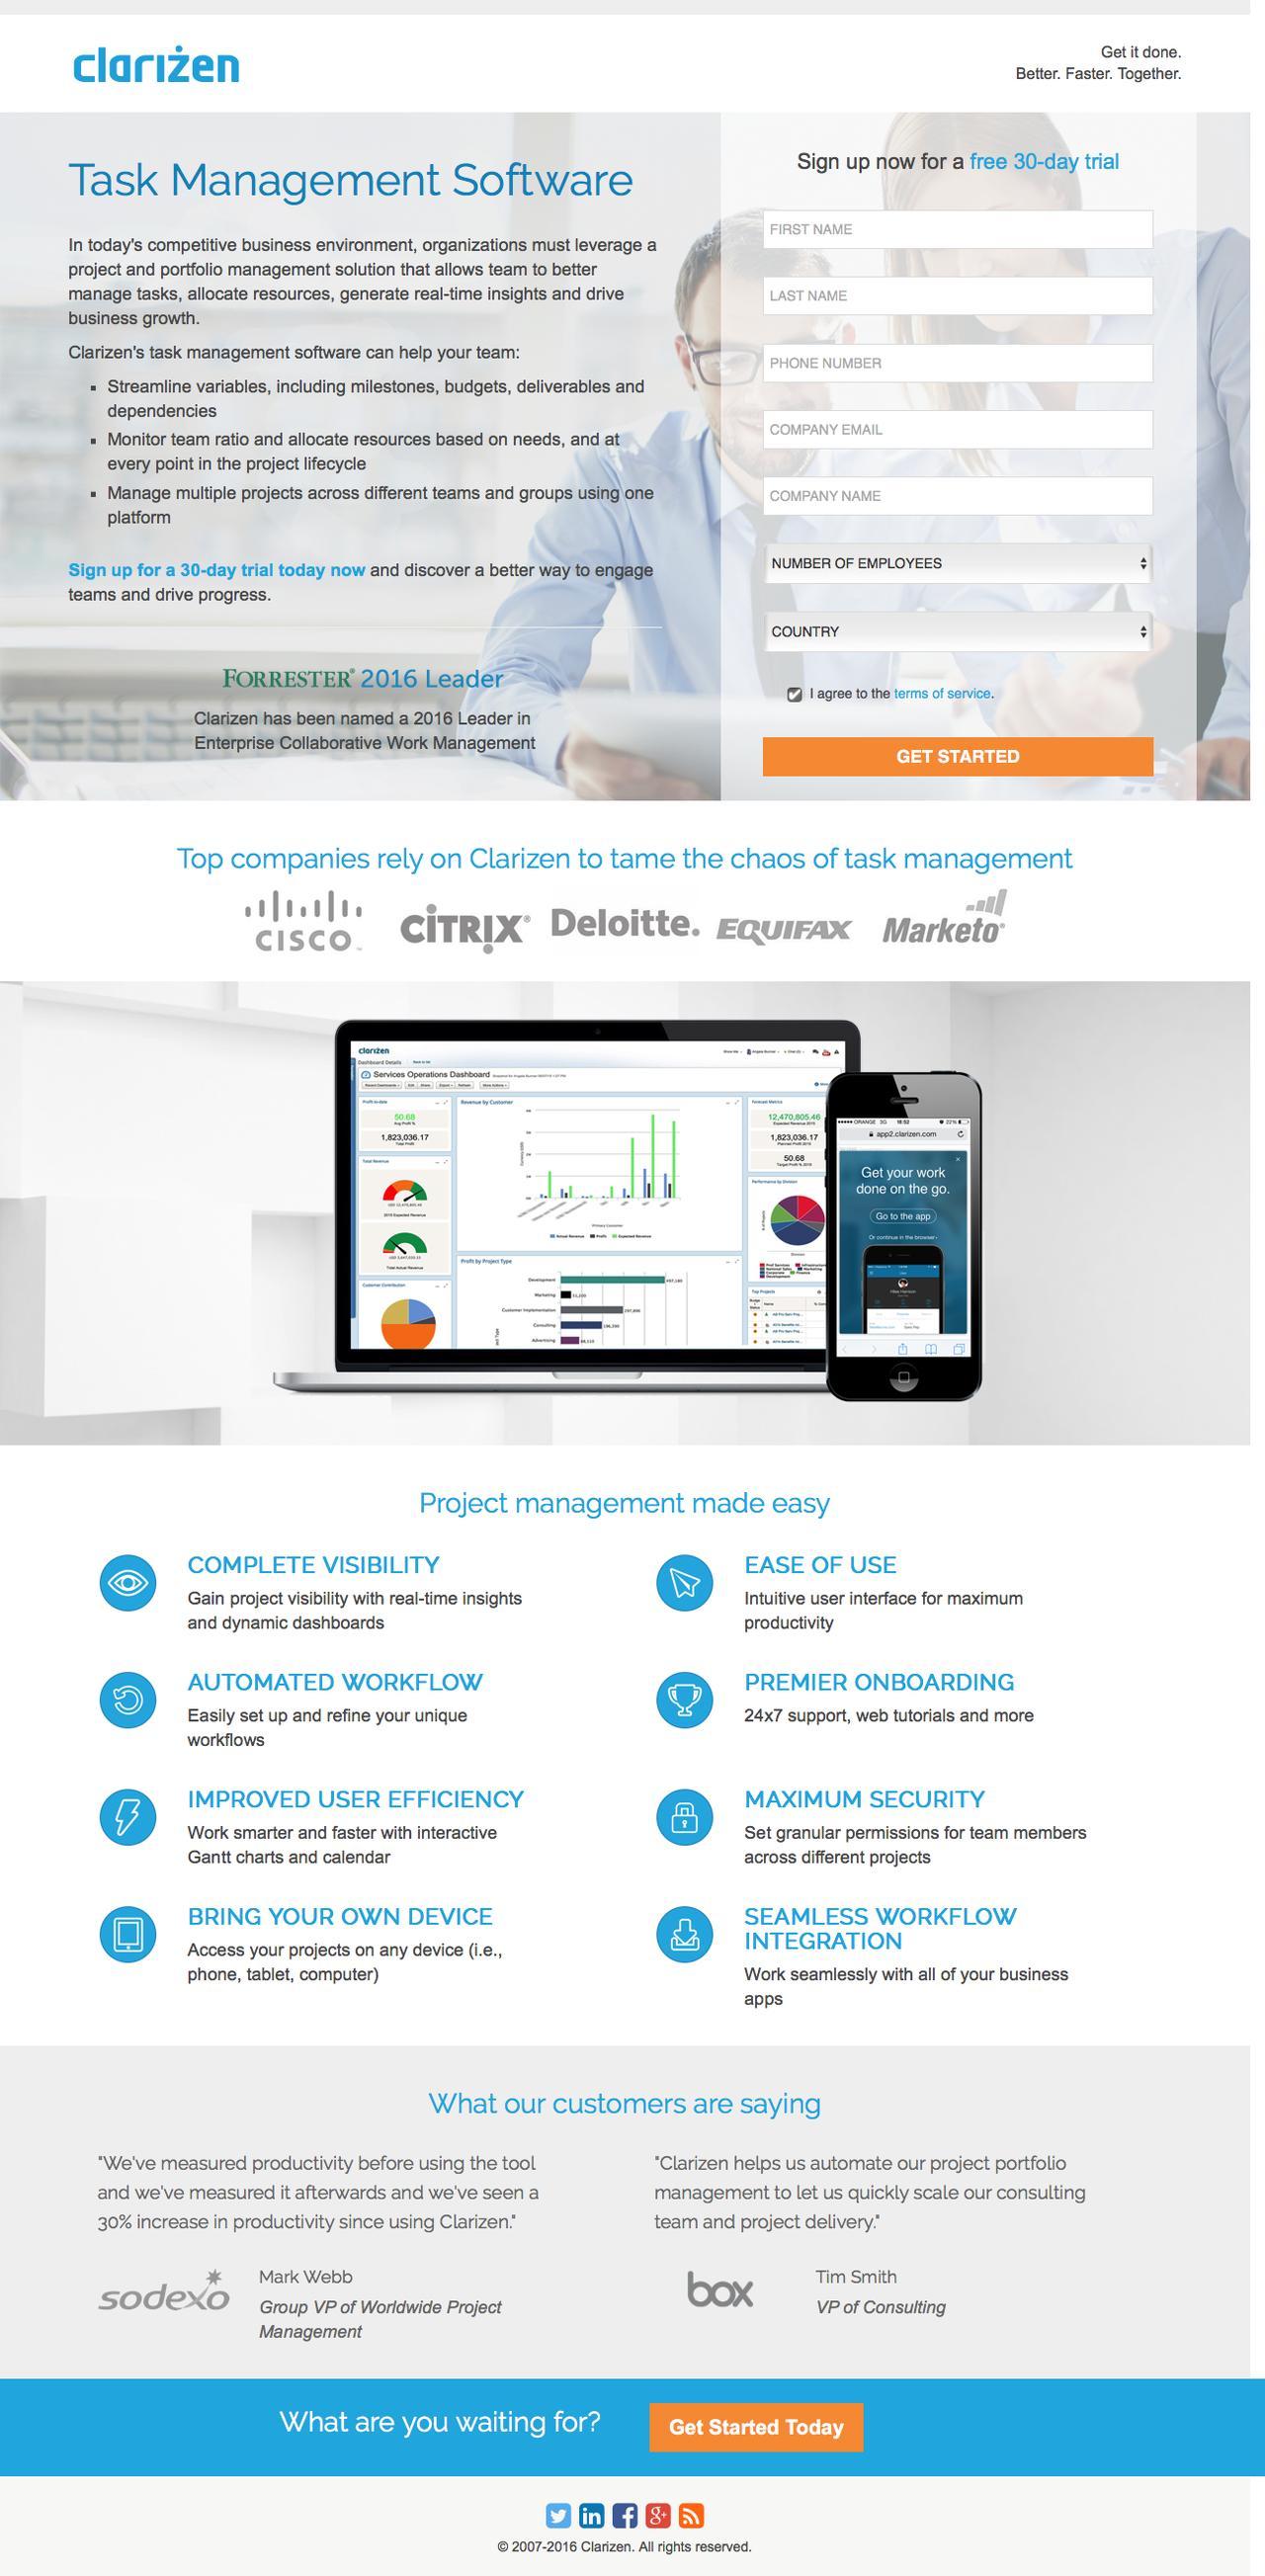 Screenshot of clarizen.com - Task Management Software l Clarizen - captured Nov. 24, 2016